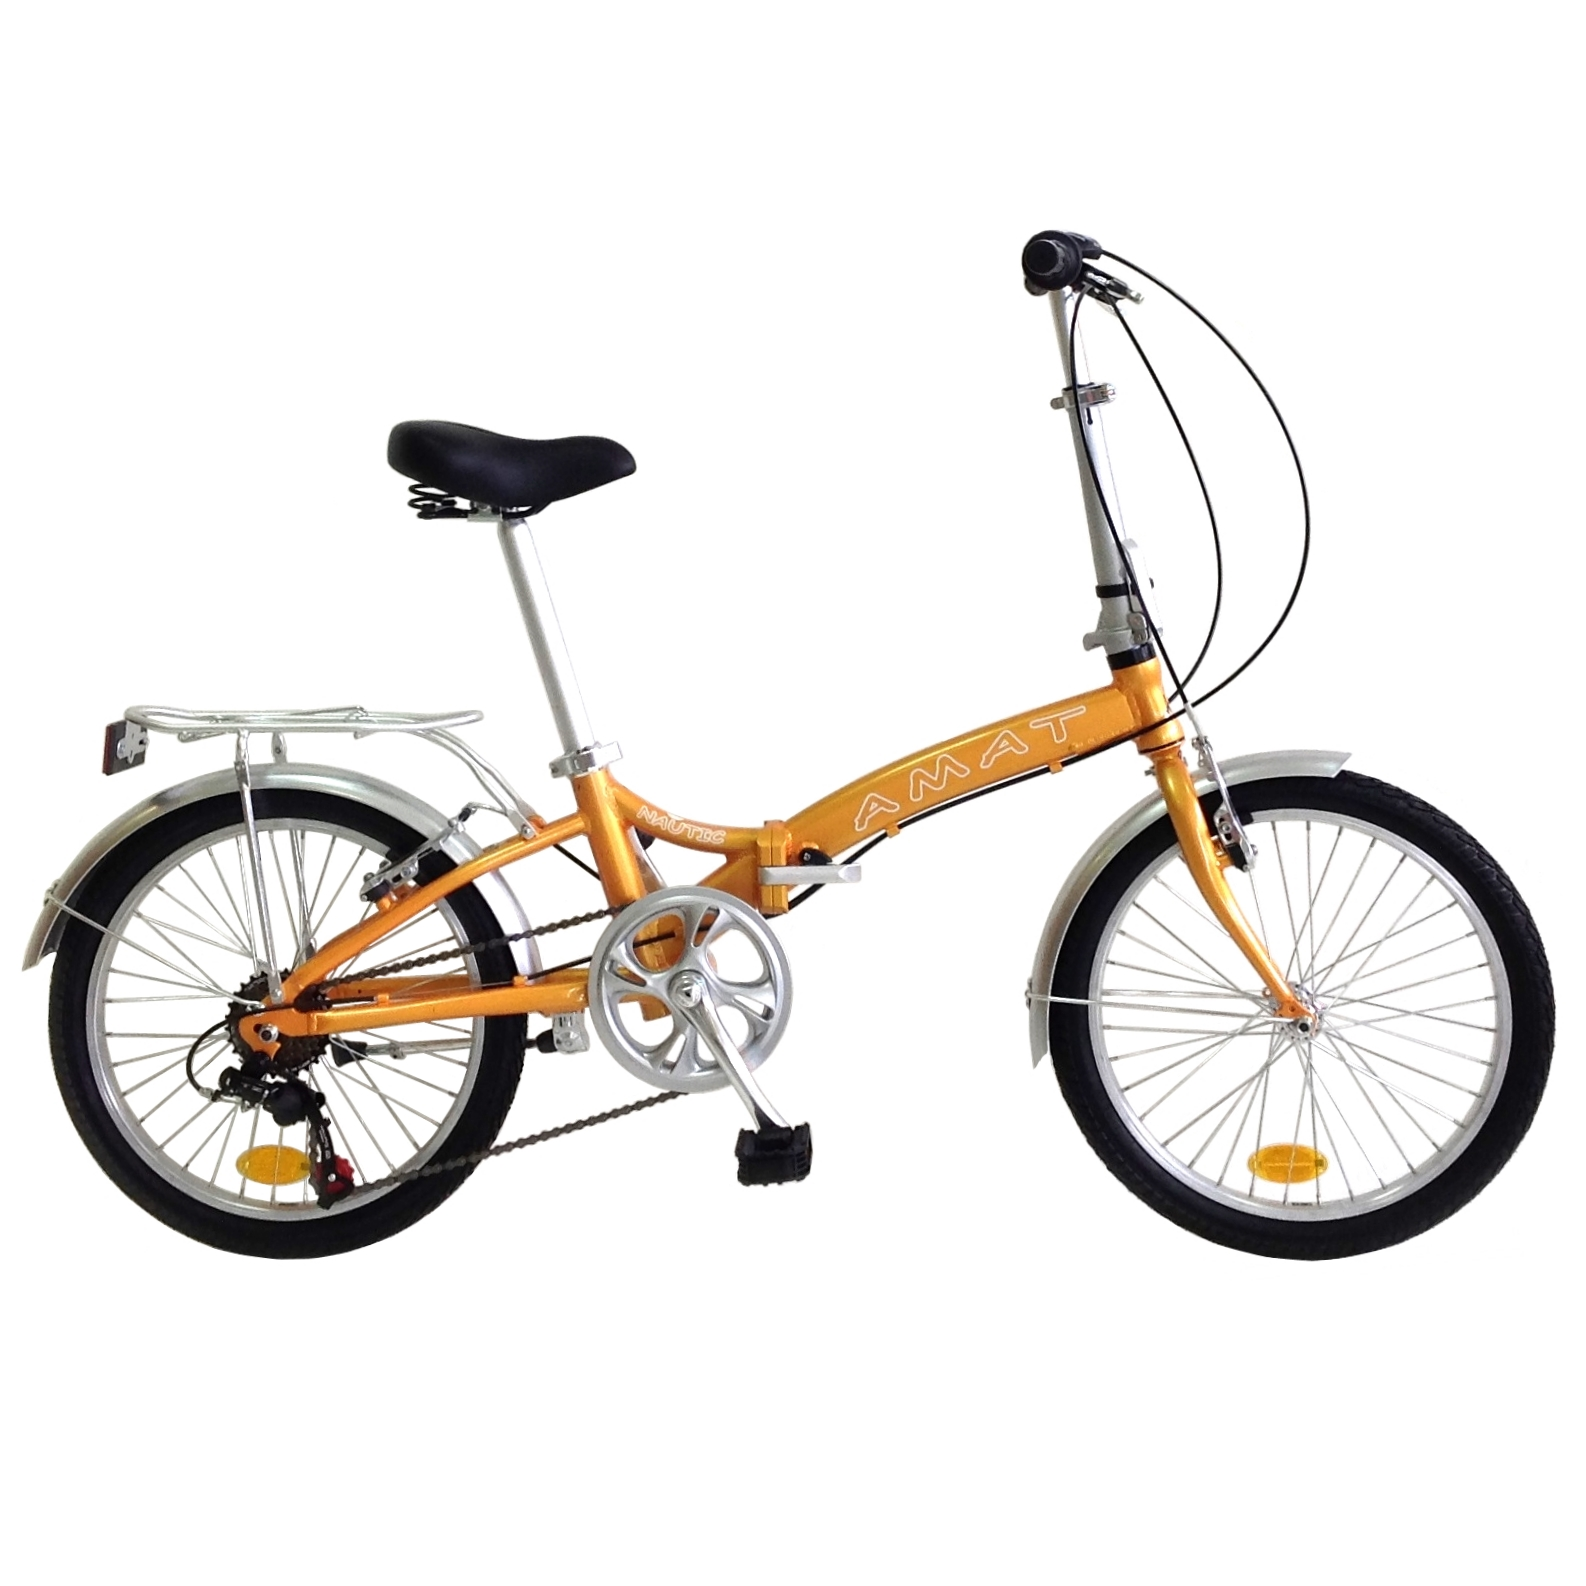 Bicis plegables Nautic 20 Naranja aluminio